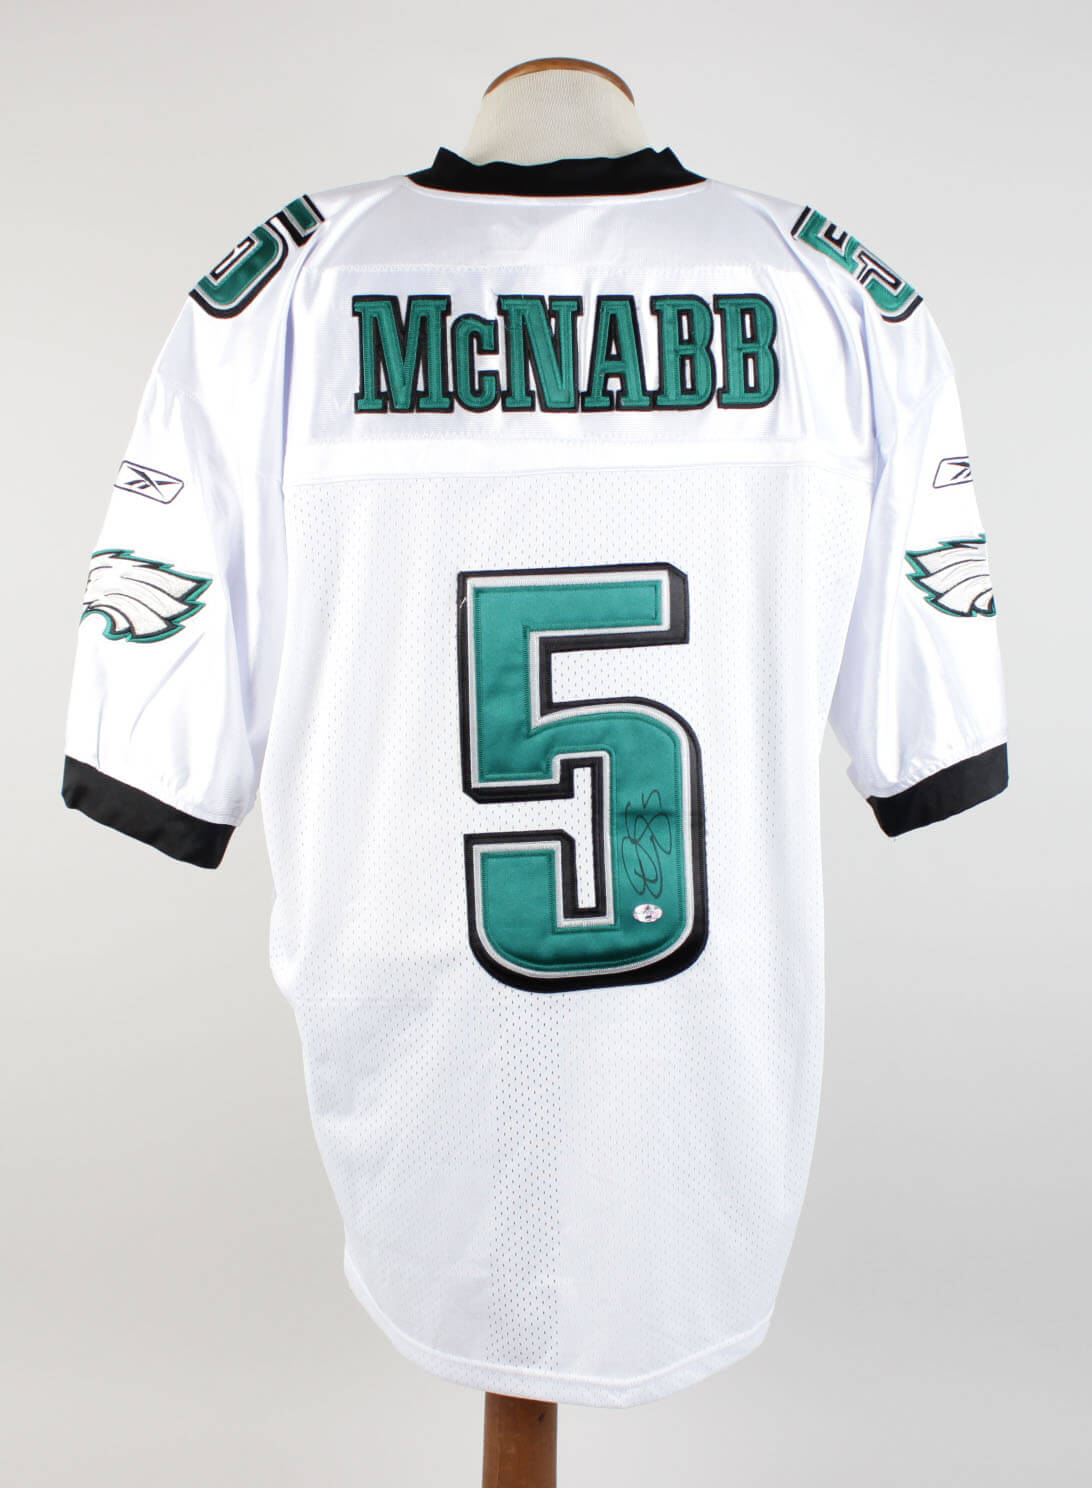 Donovan McNabb Signed & Inscribed (5) Philadelphia Eagles White Jersey Signature Grades 9-10